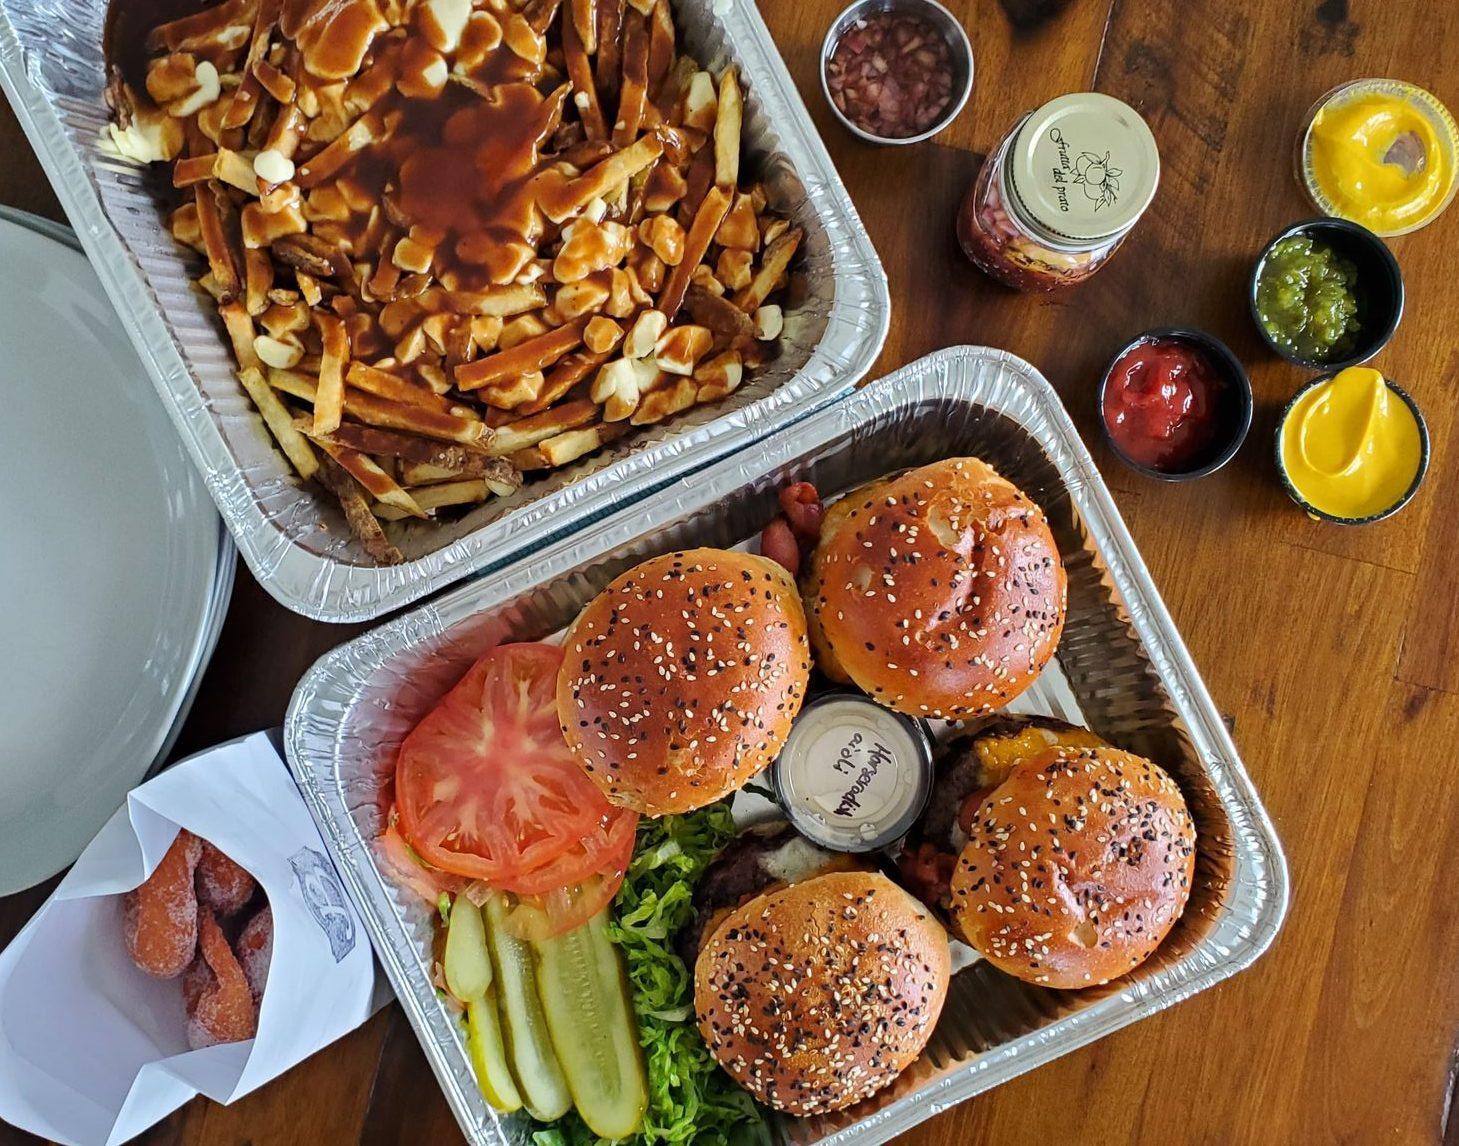 Barrington Steakhouse Burgers & Poutine